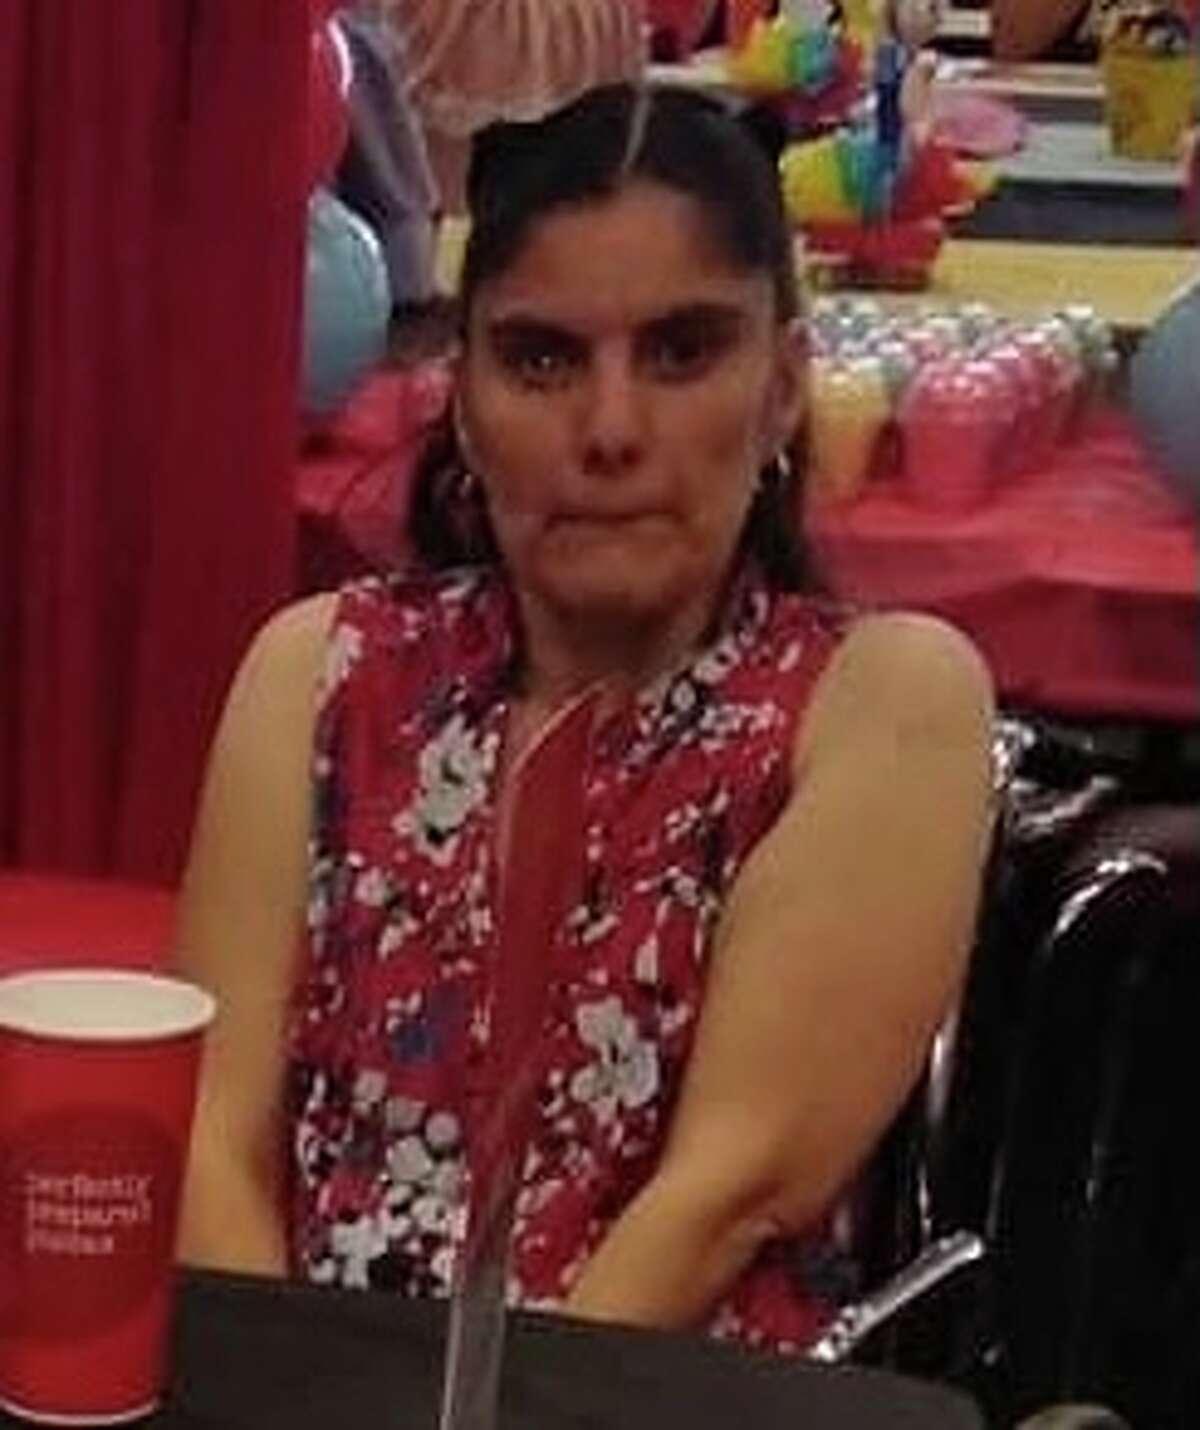 Beatriz Joanna Diaz Leyva